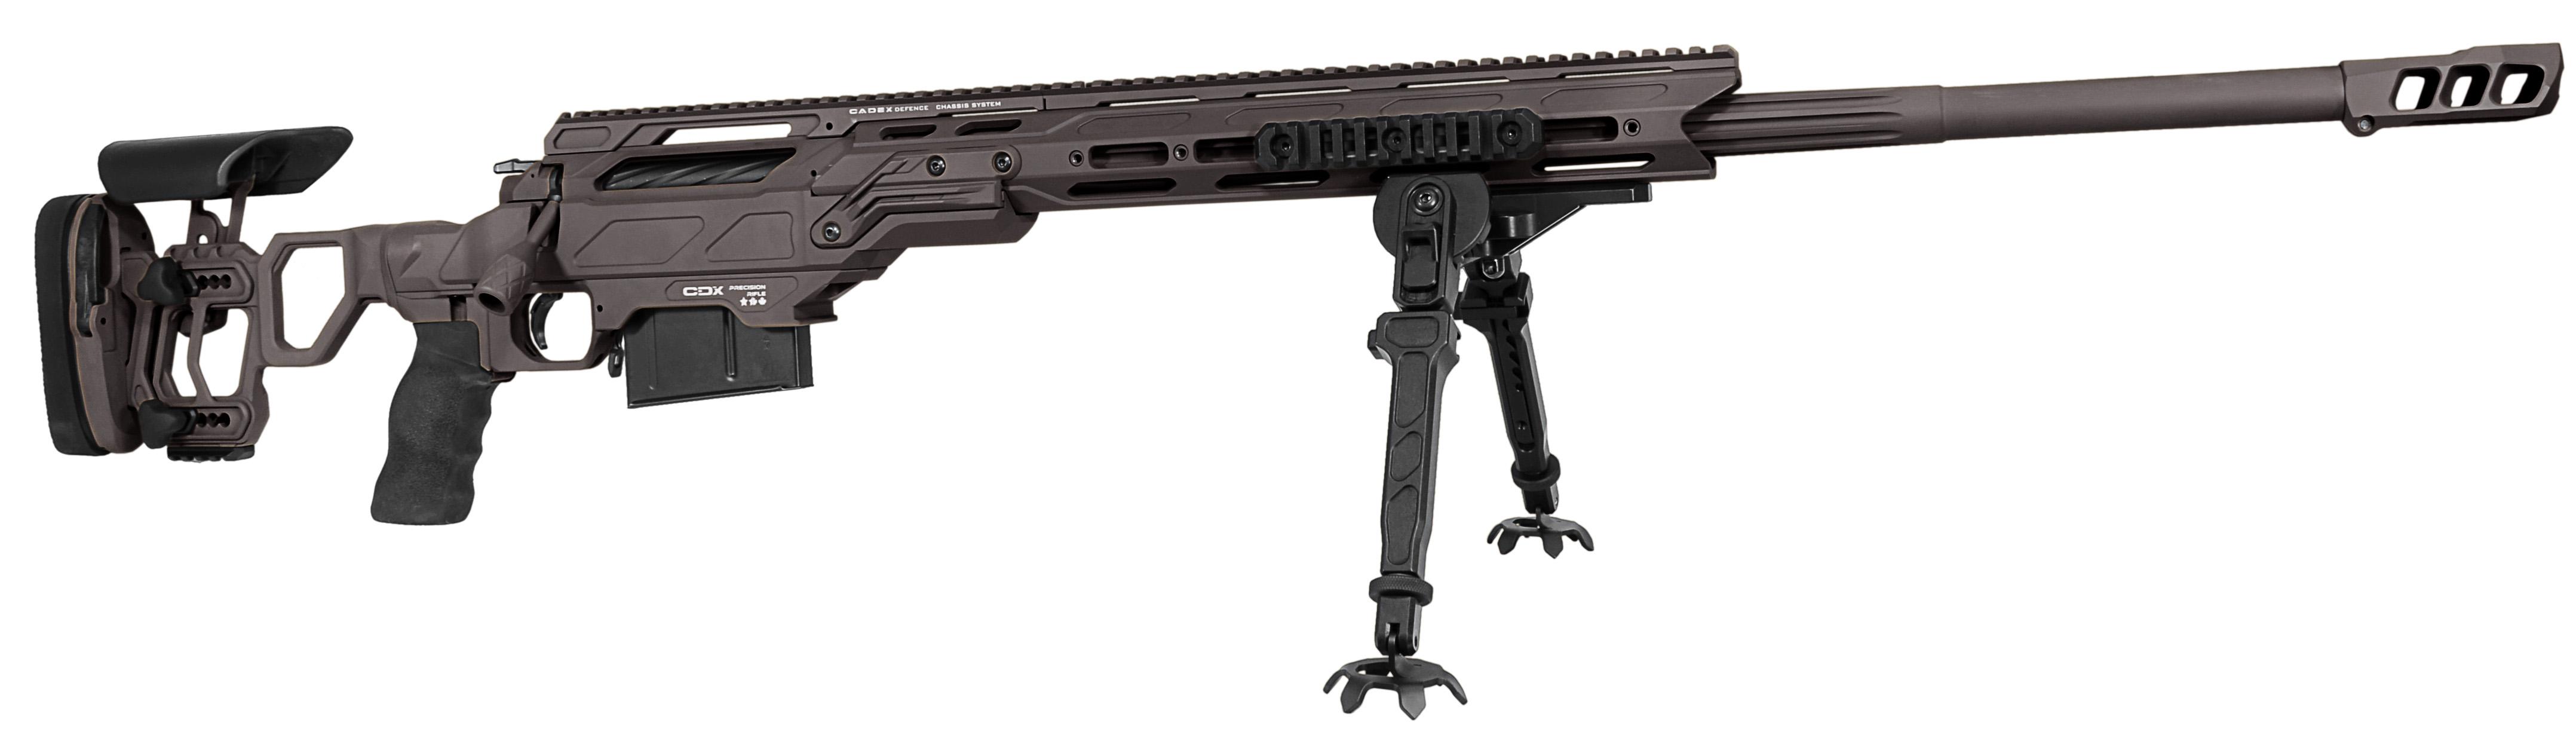 Cadex Defence - Patriot Tac Rifle (338 Lapua Mag)